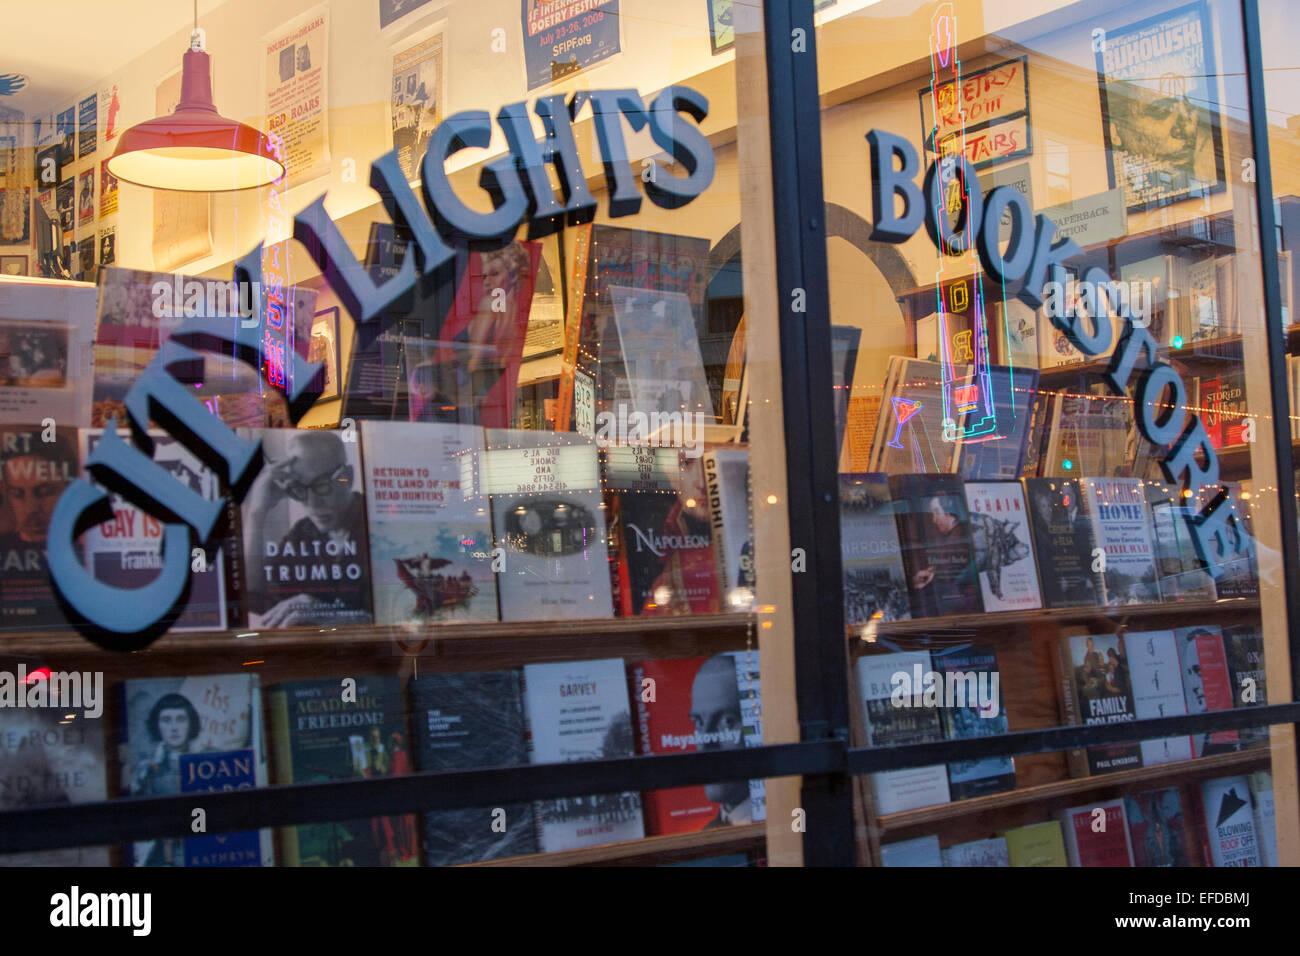 City Lights Bookstore in North Beach, San Francisco, California. - Stock Image